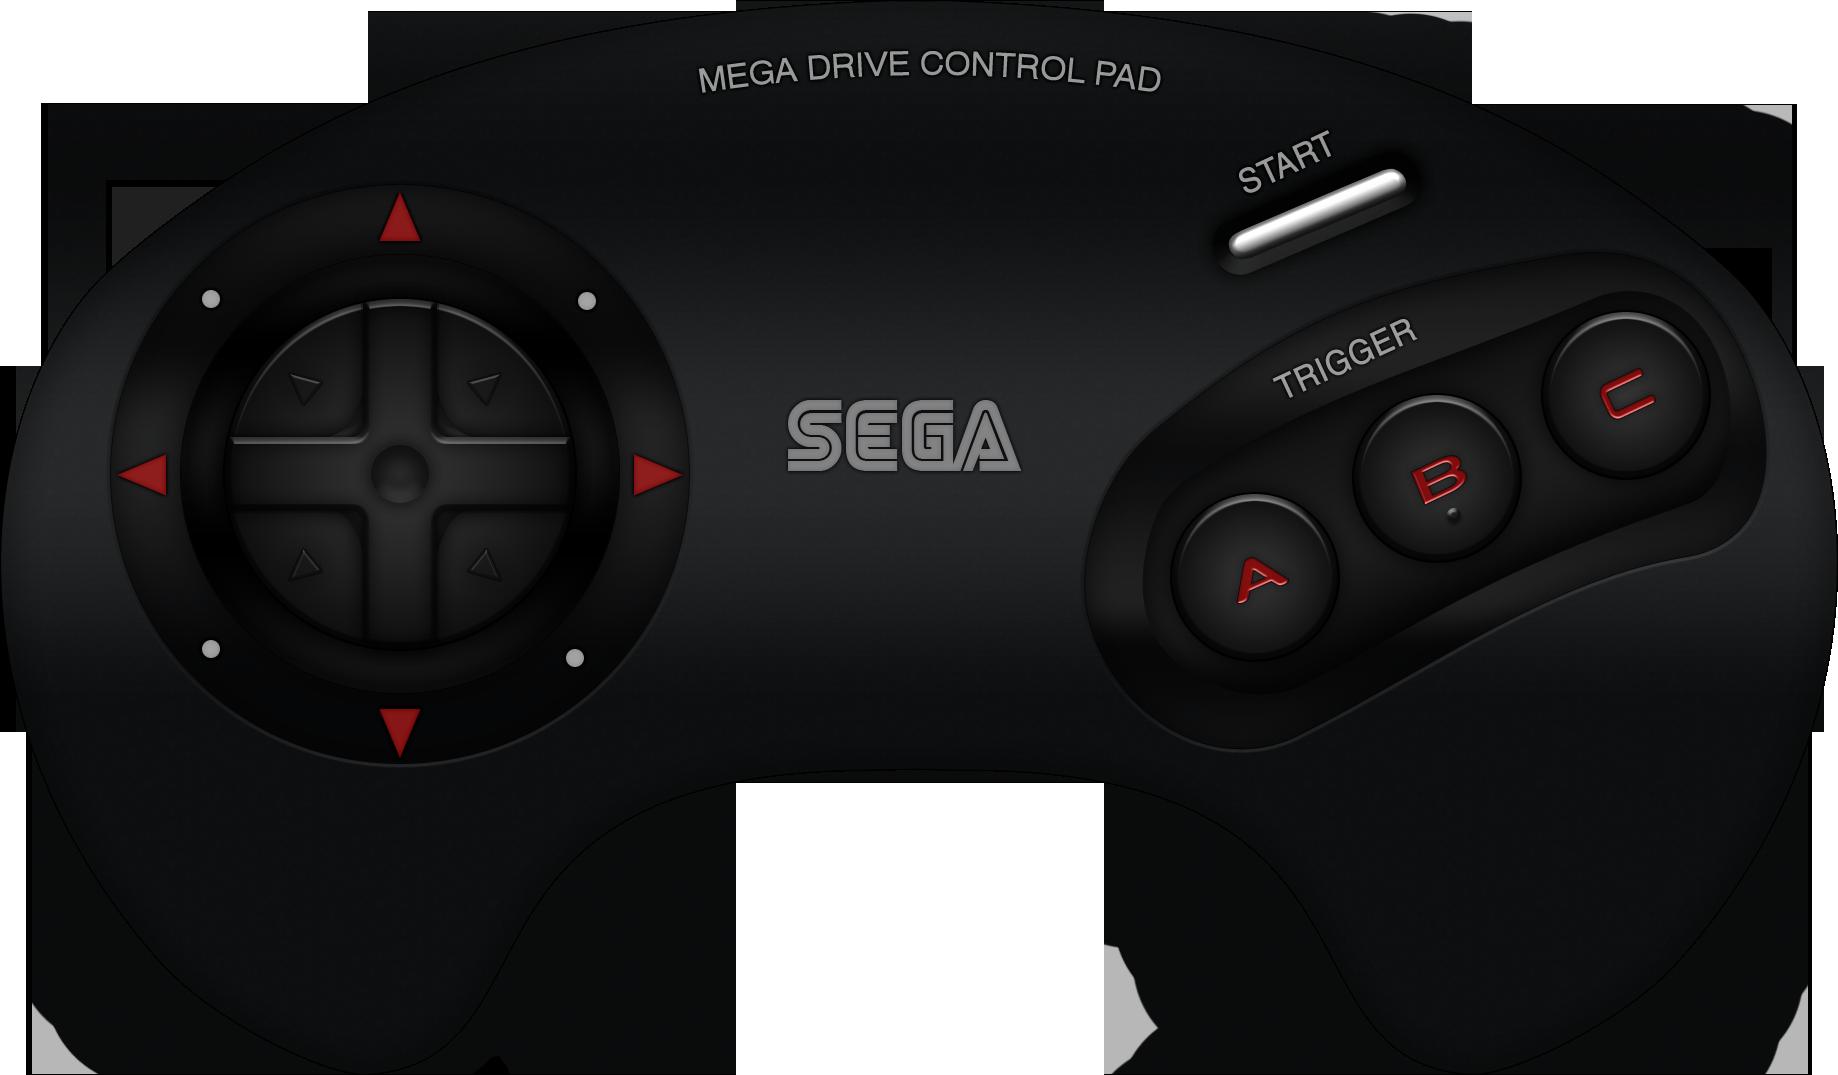 Sega Mega Drive Button Controller By Blueamnesiac D B H J.